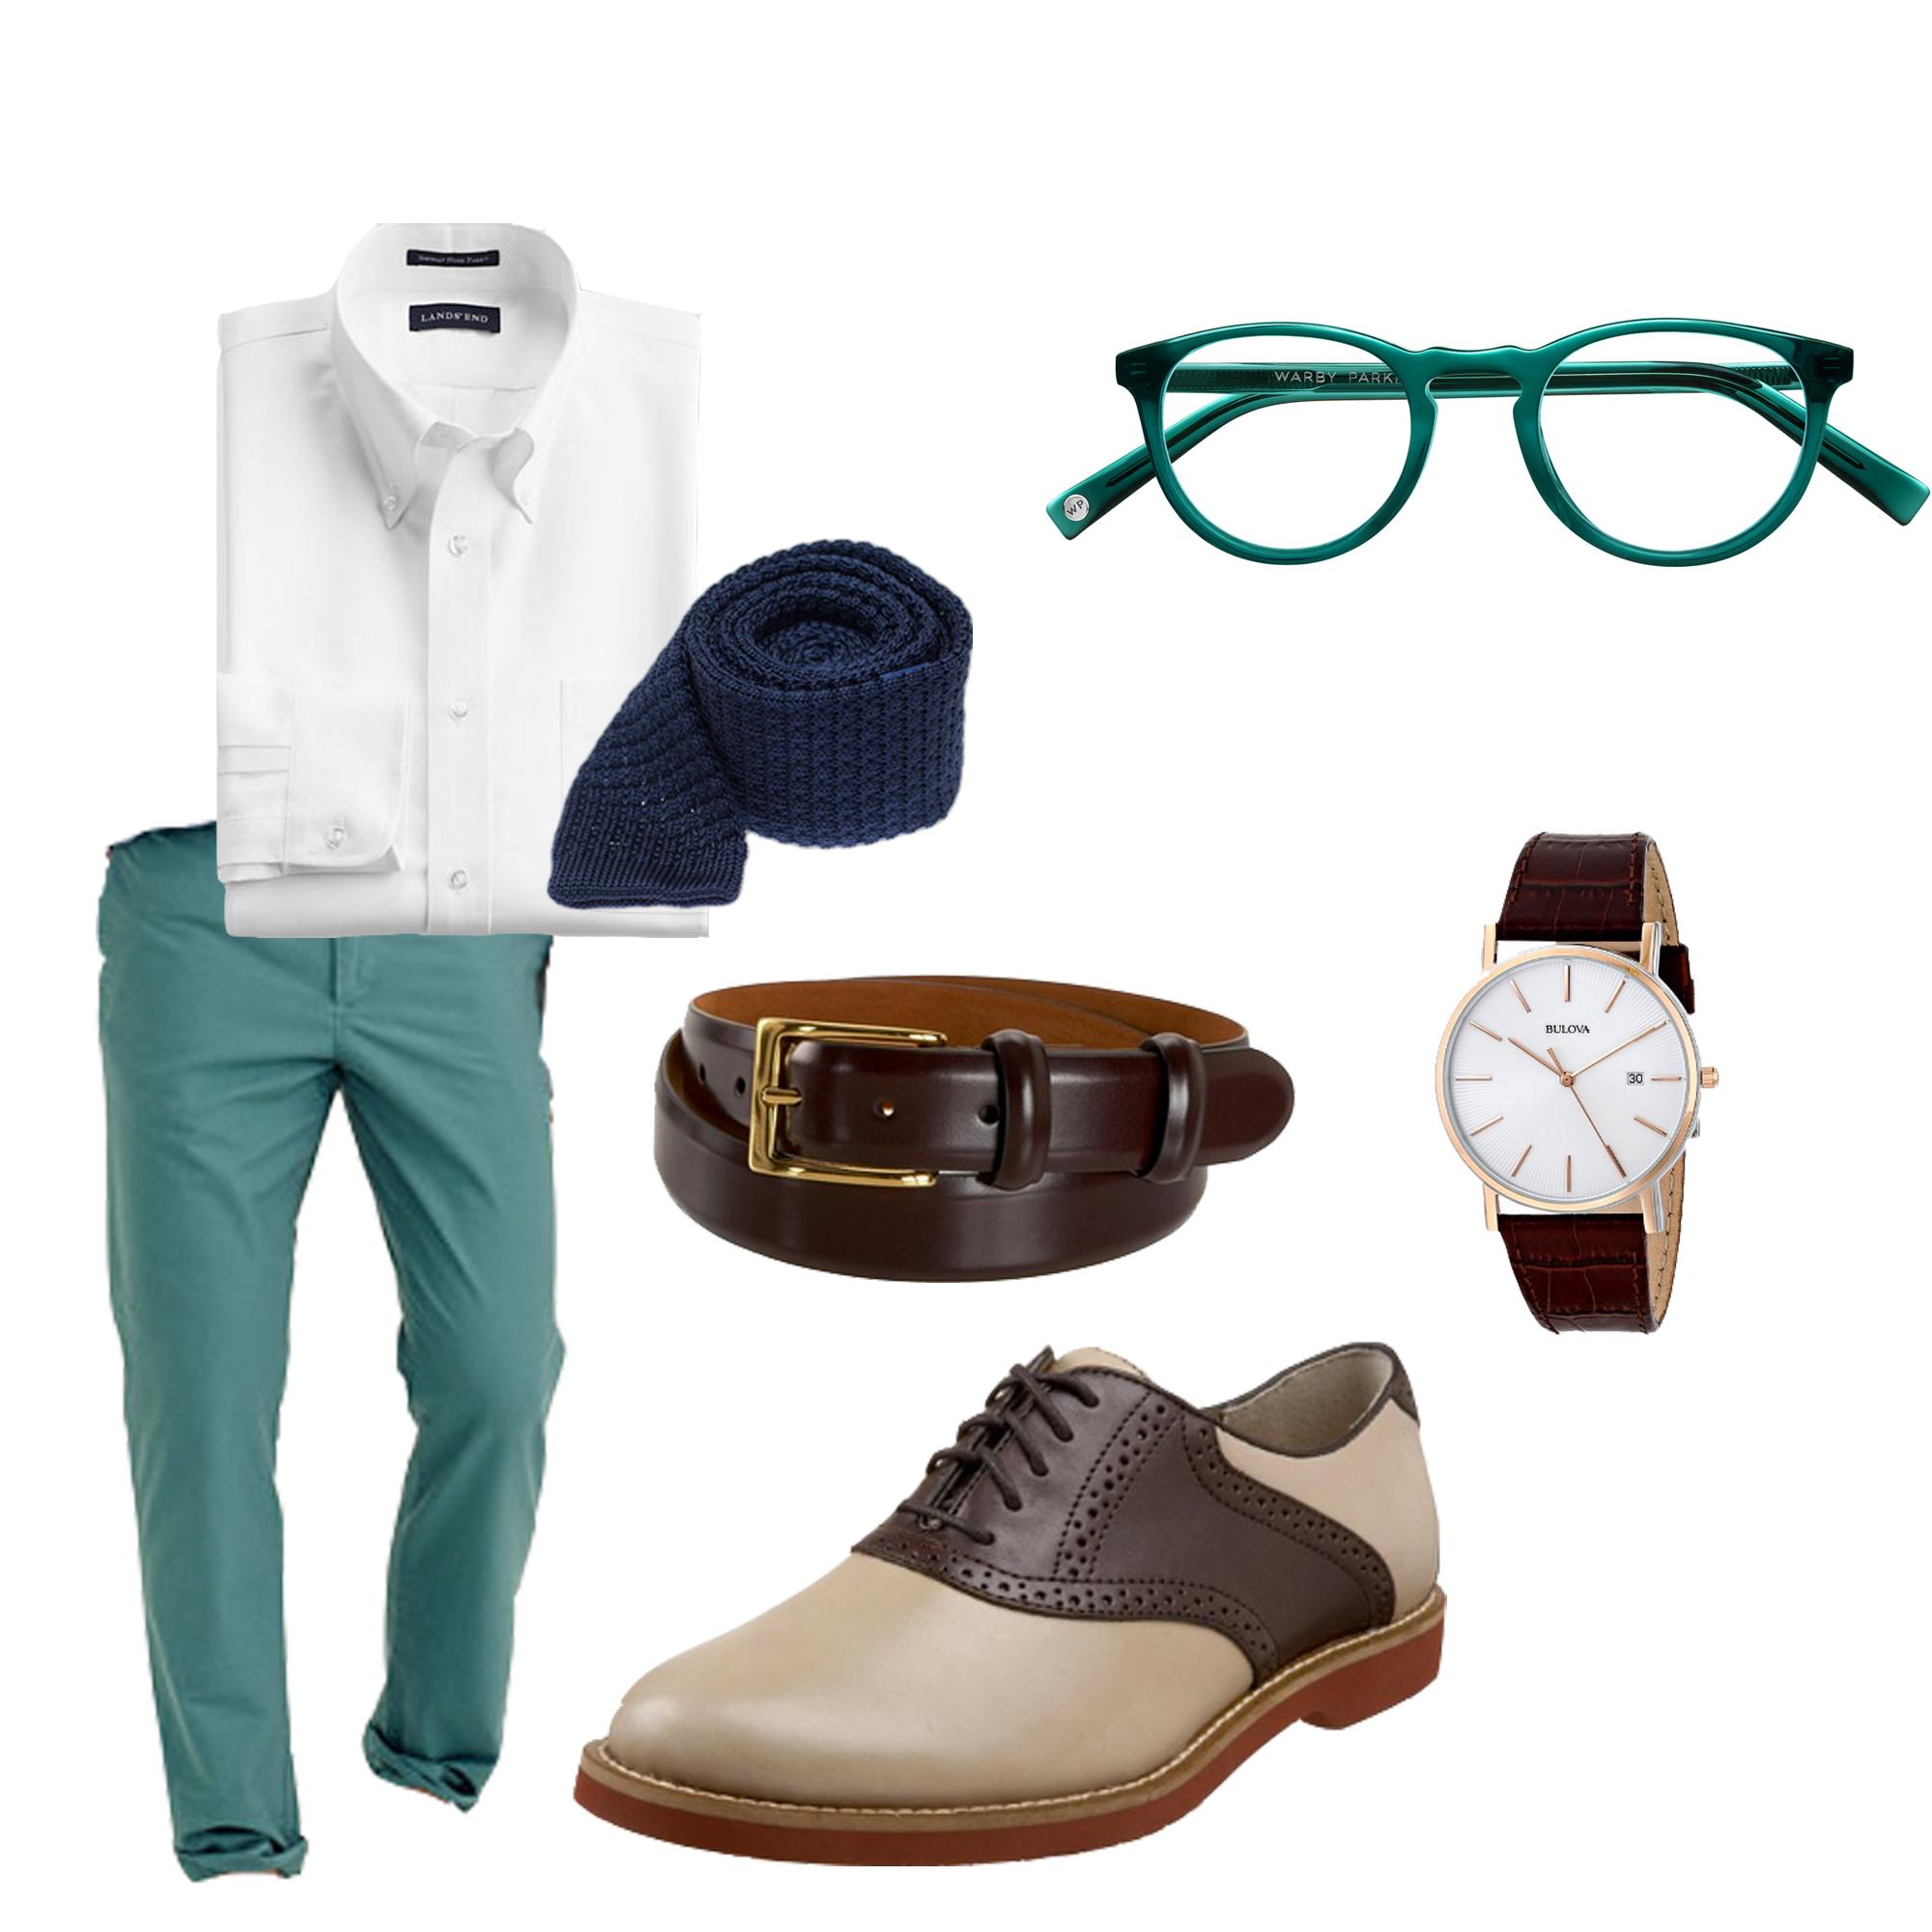 menswear warby parker summer 2015